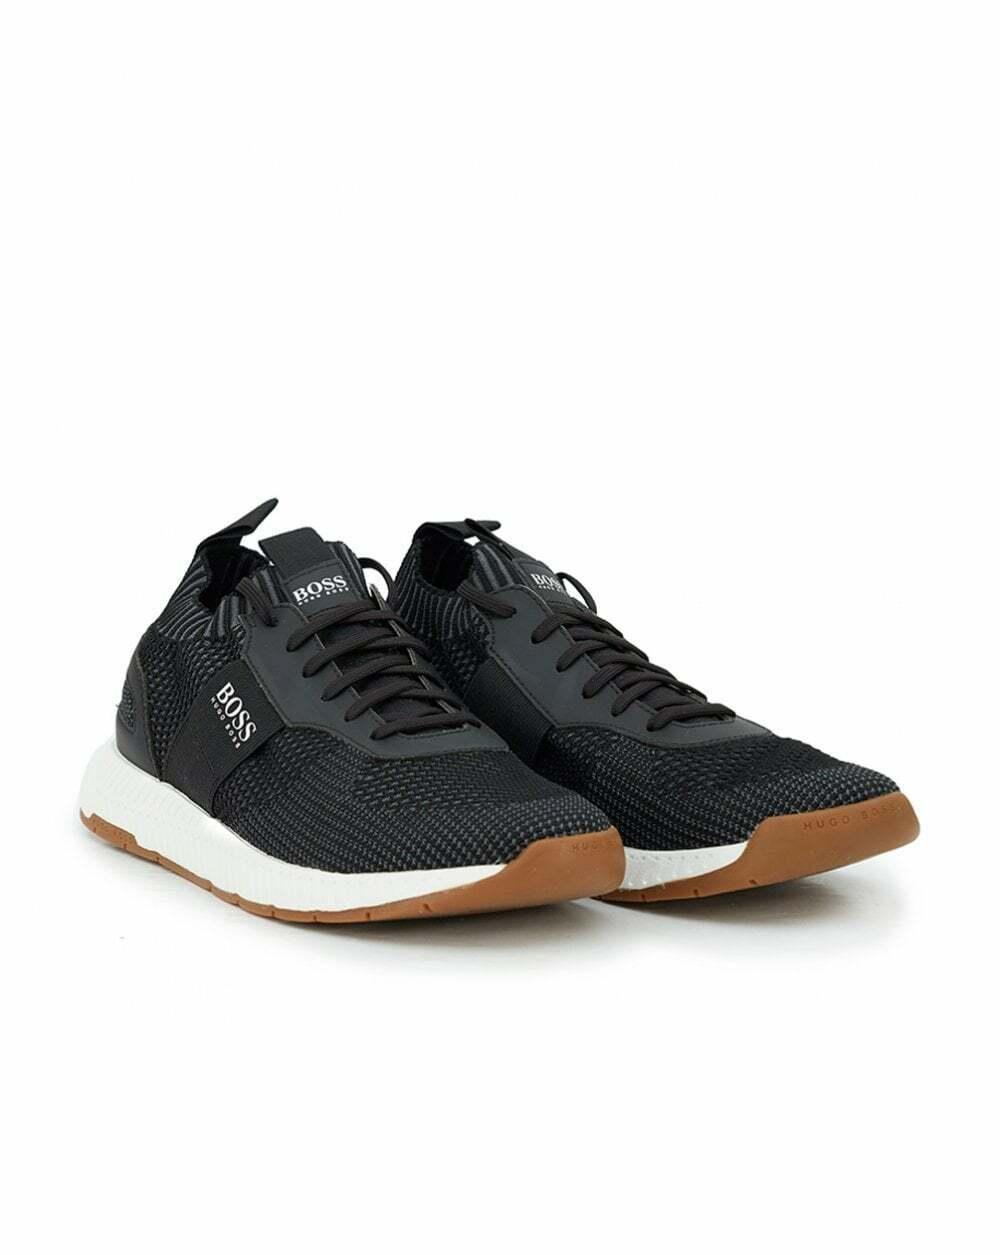 Hugo Boss Titanium Running Mens Trainers Lightweight Fitness Footwear scarpe da ginnastica